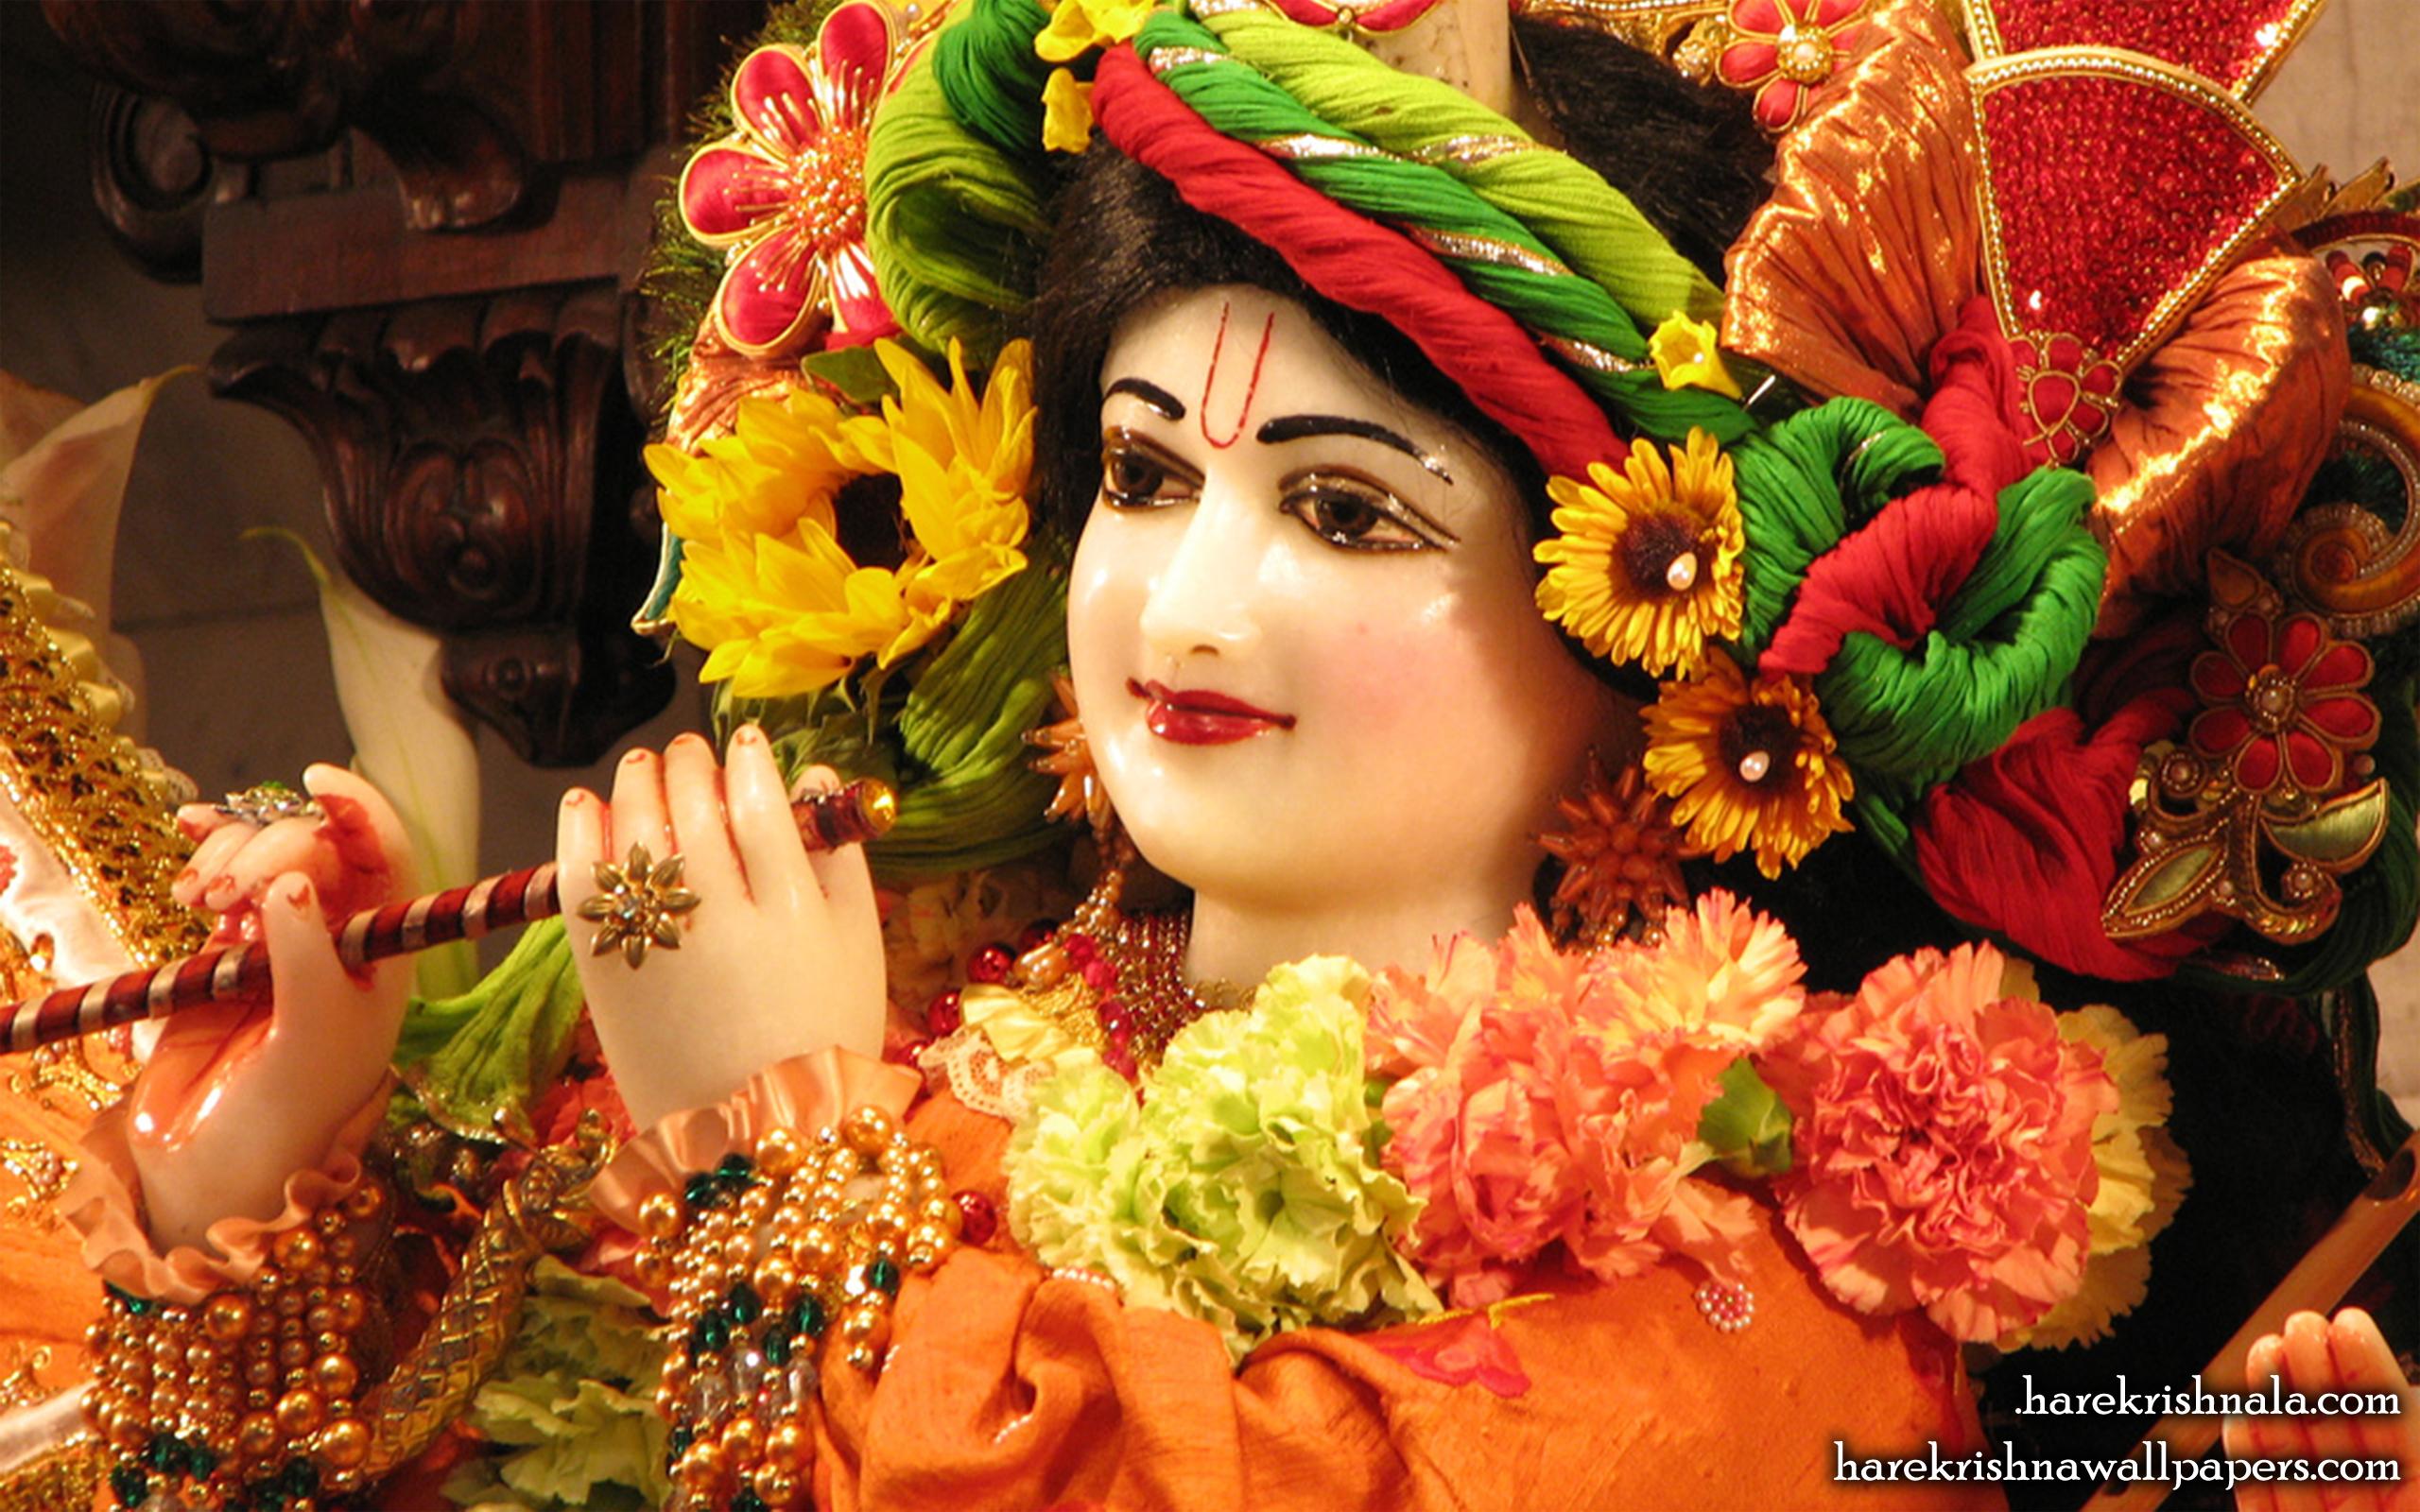 Sri Dwarakadhish Close up Wallpaper (002) Size 2560x1600 Download